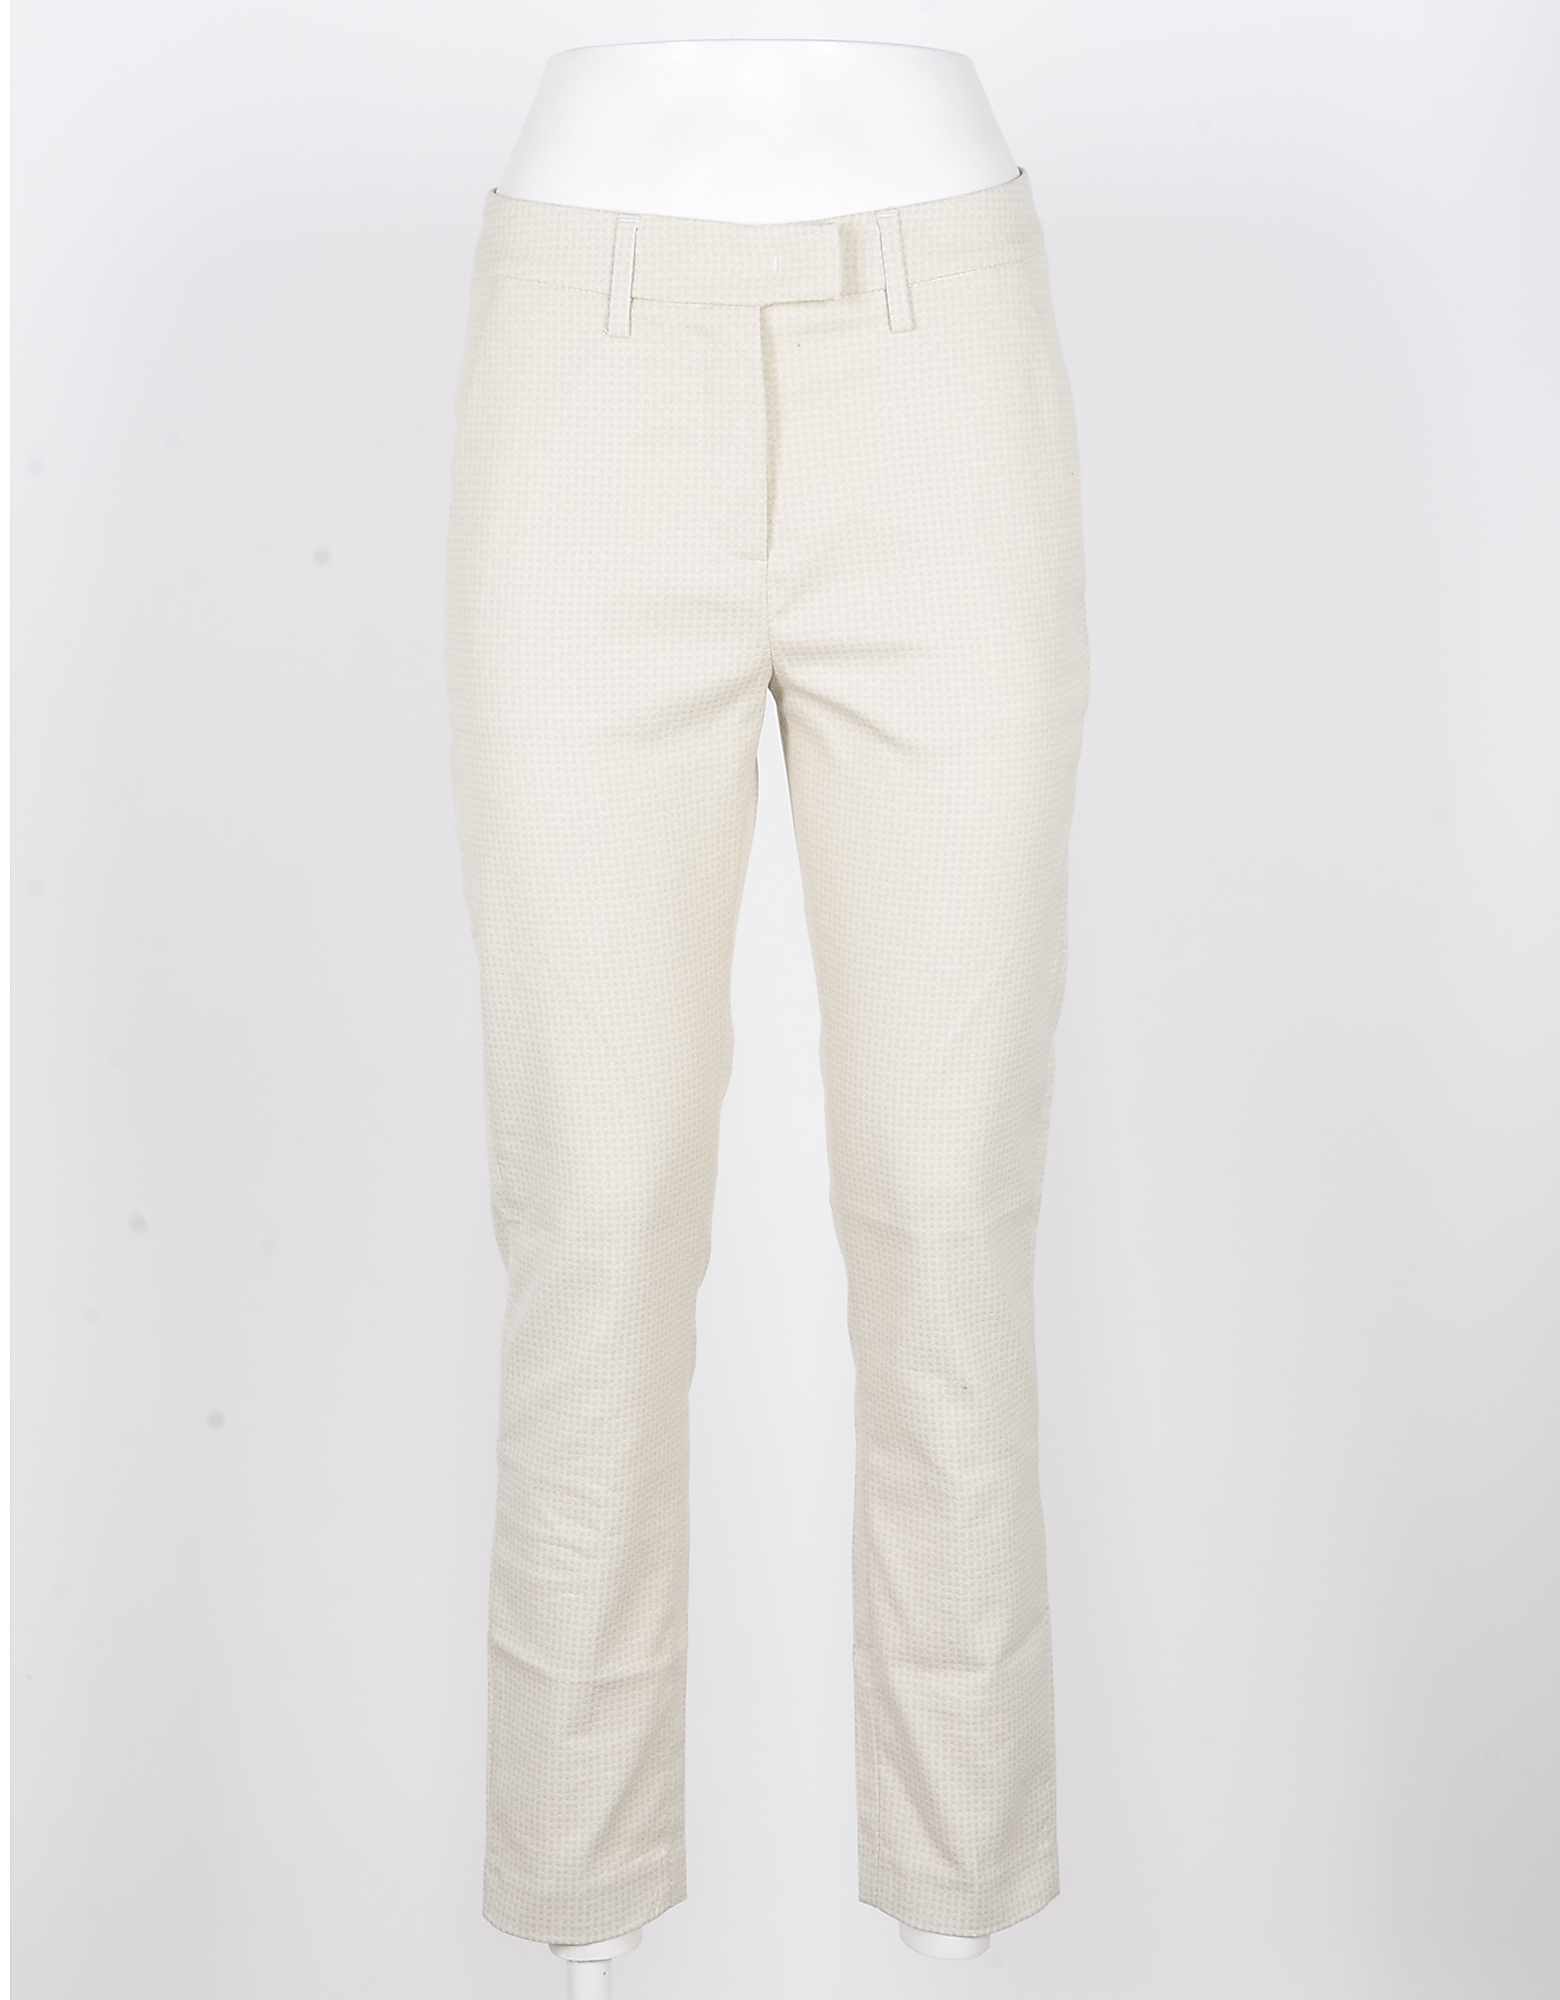 Dondup Designer Pants, Women's Cream Pants